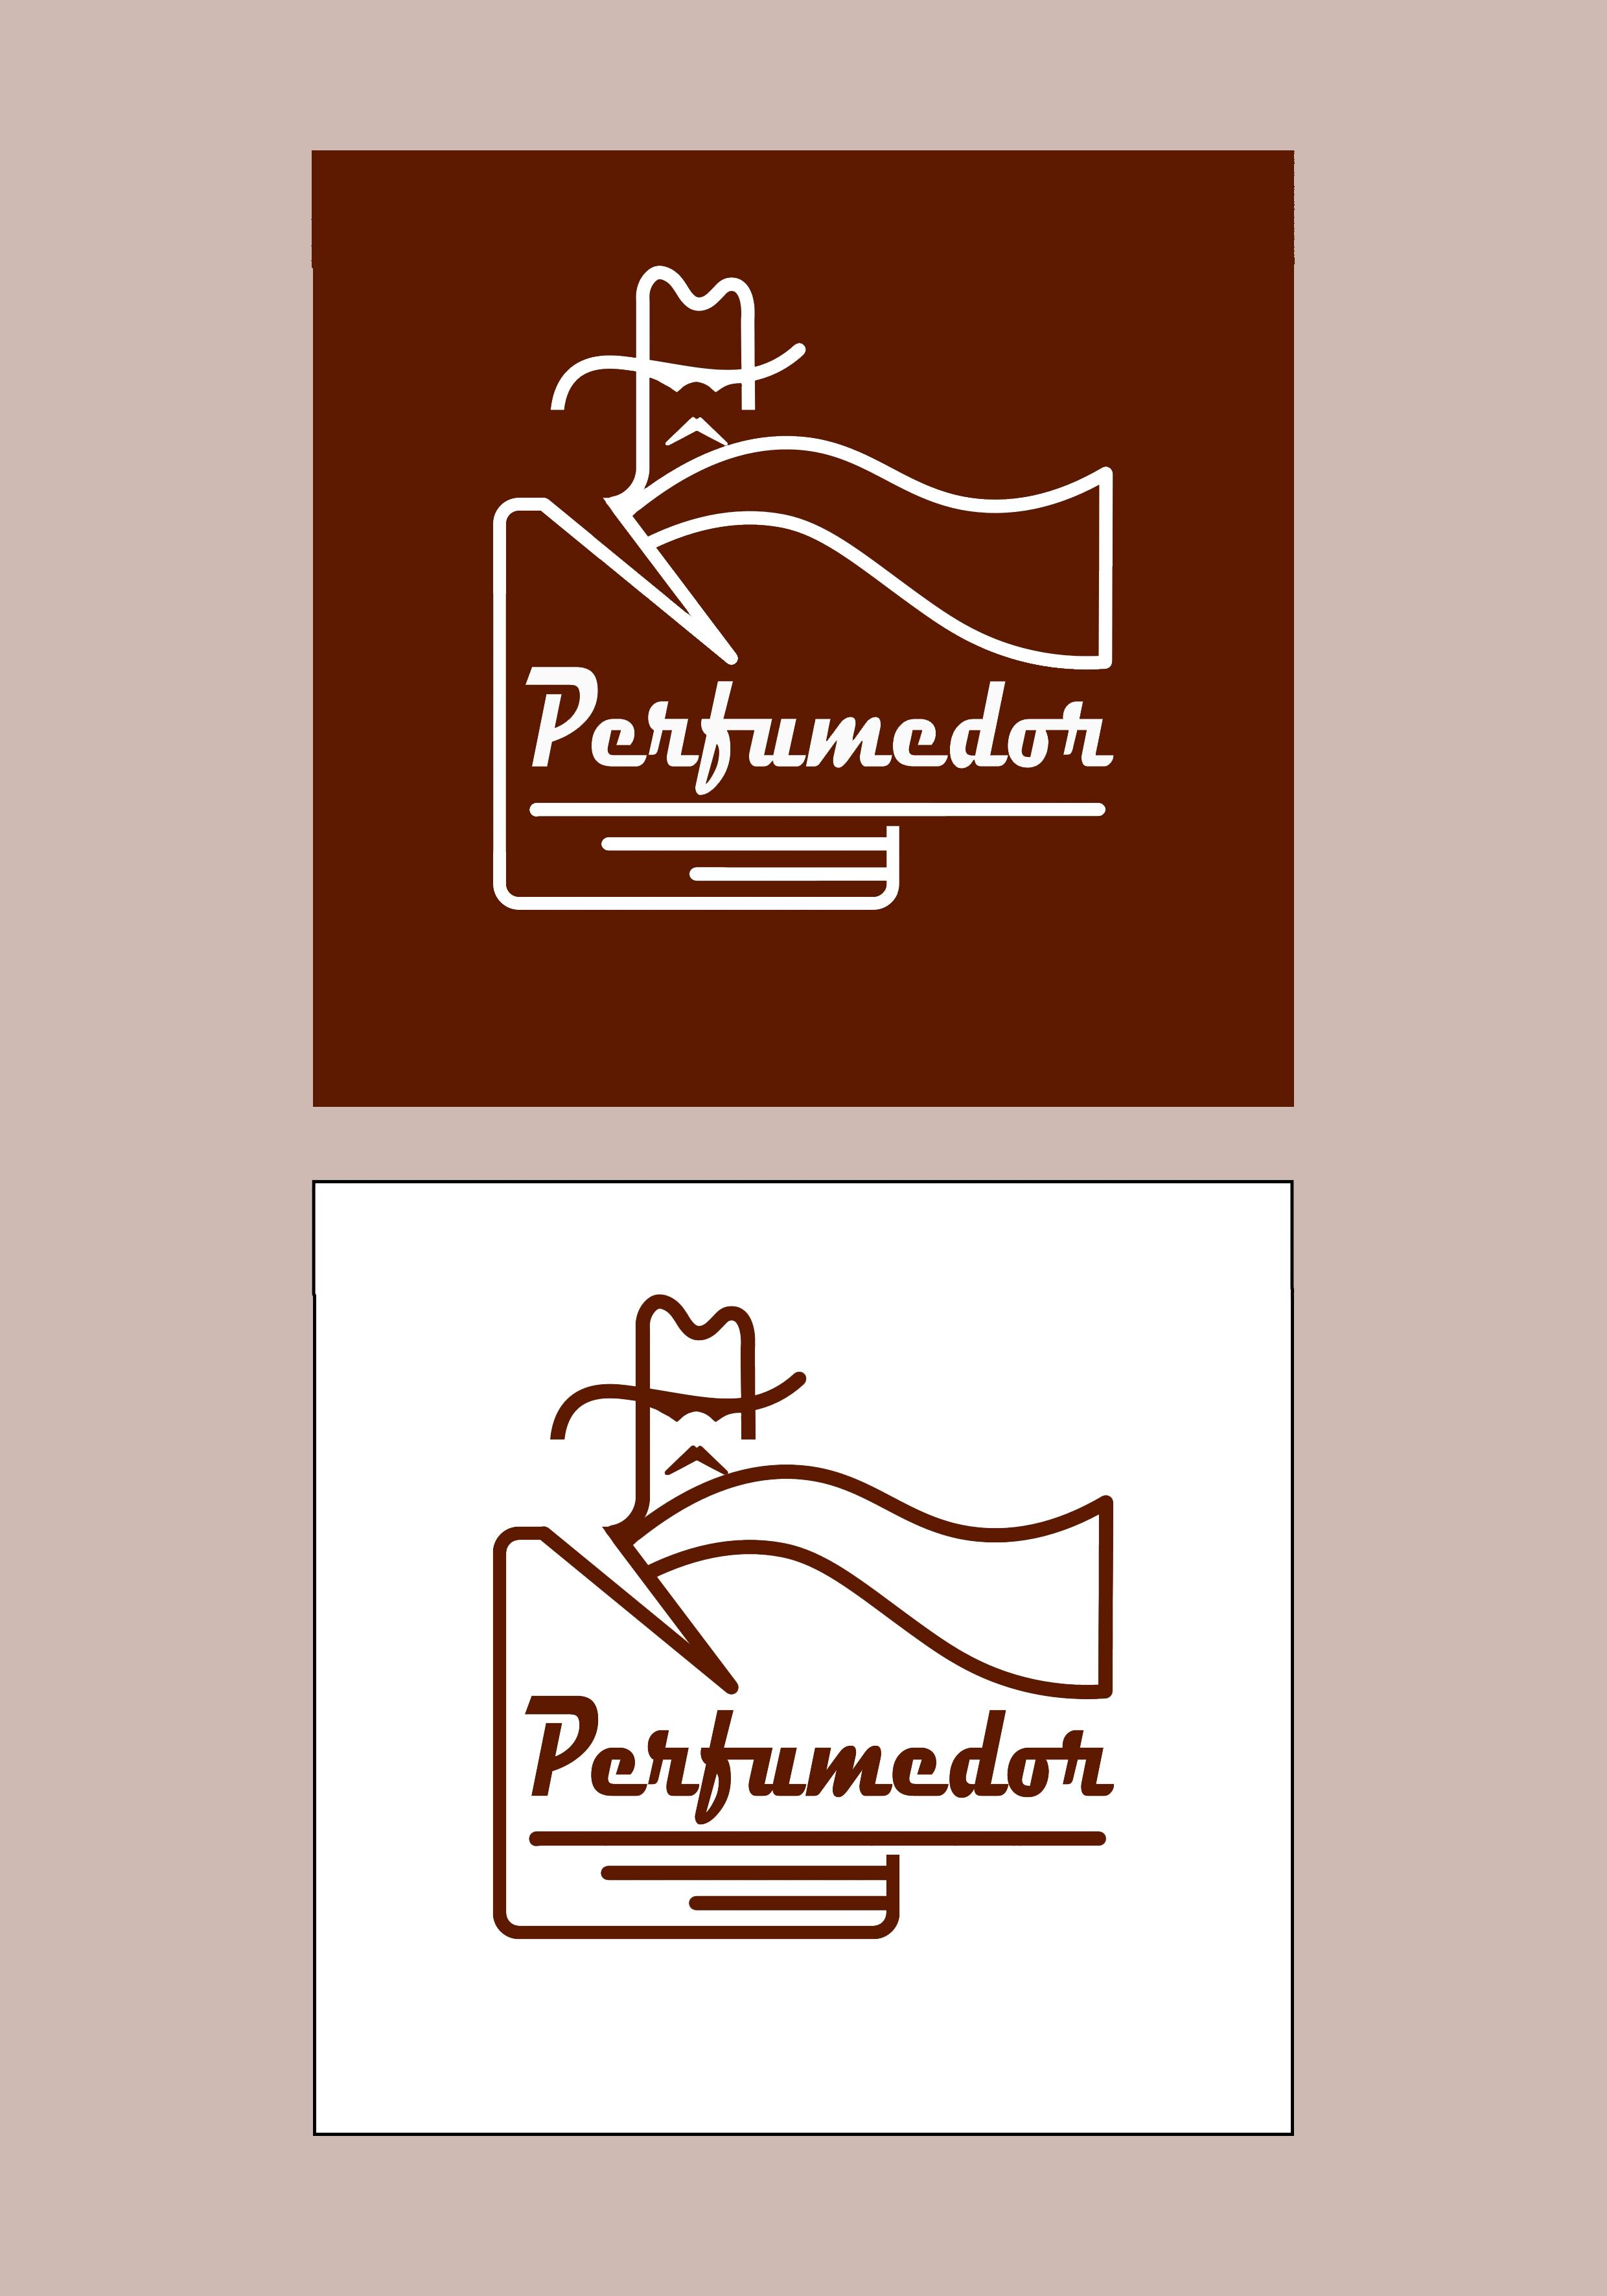 Логотип для интернет-магазина парфюмерии фото f_3595b477ec18394b.jpg